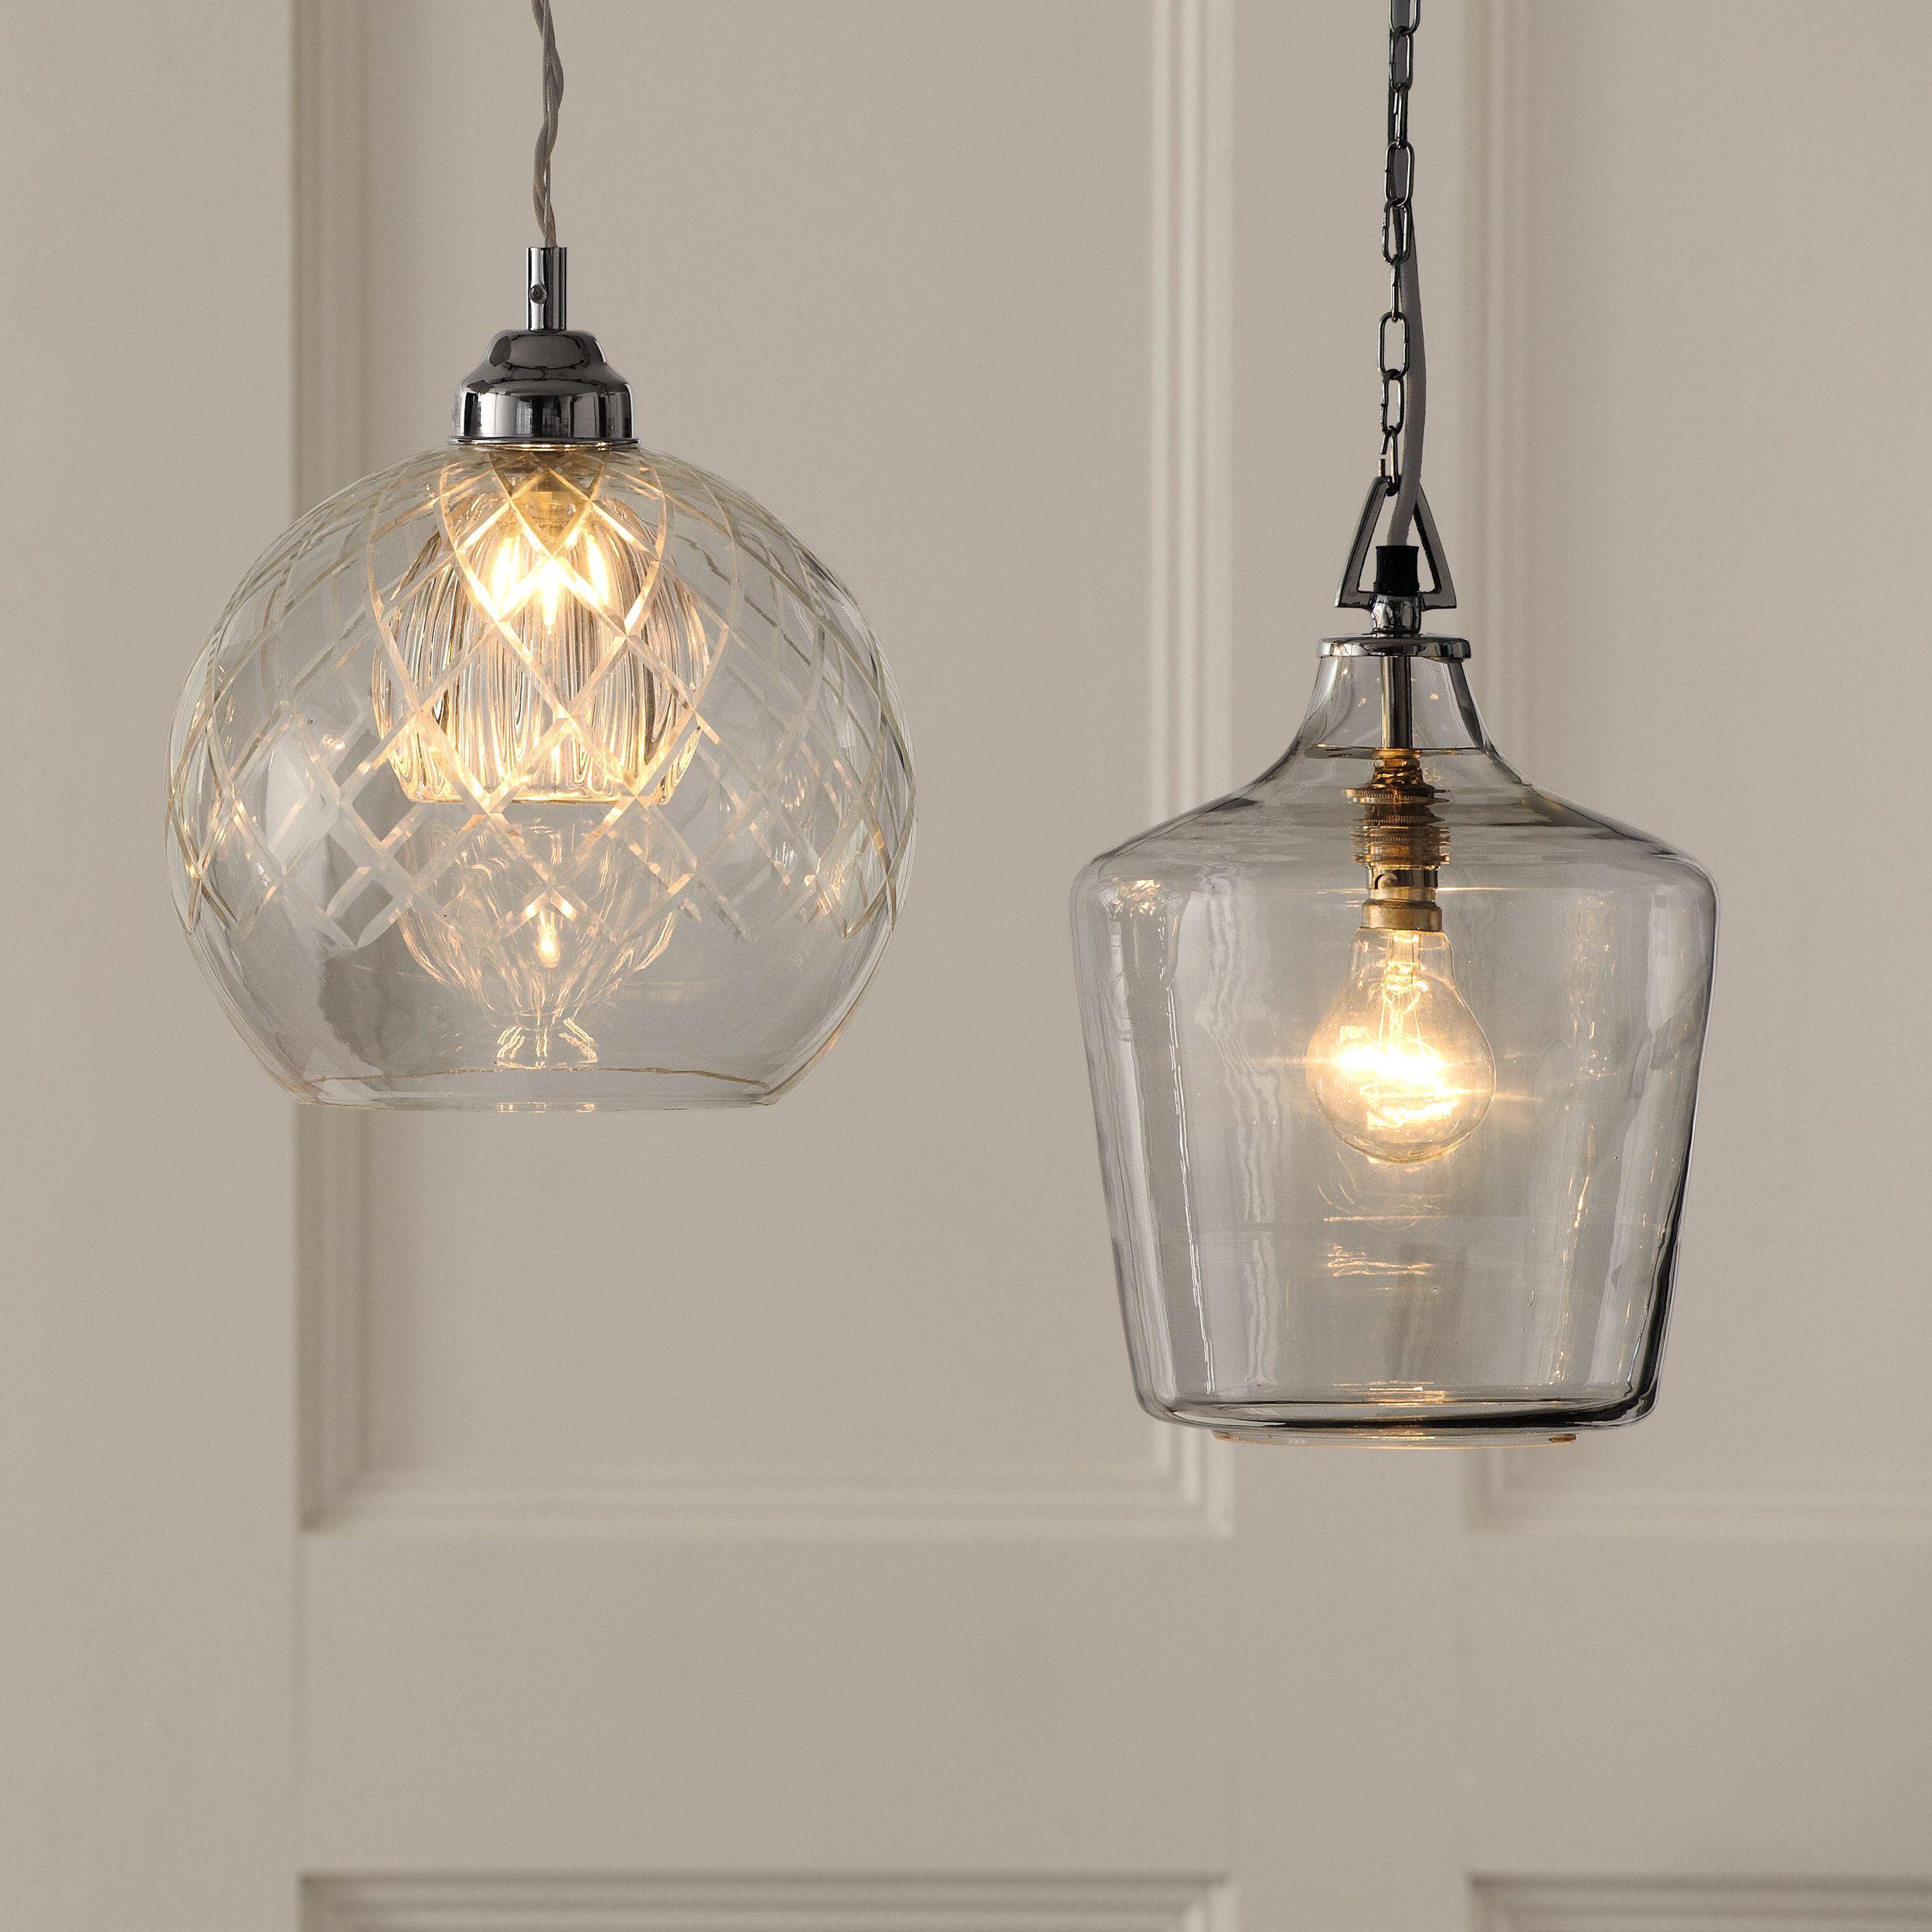 mason galvanized milk lamp glass chandelier pendant annette products light fixture goods the jar canning